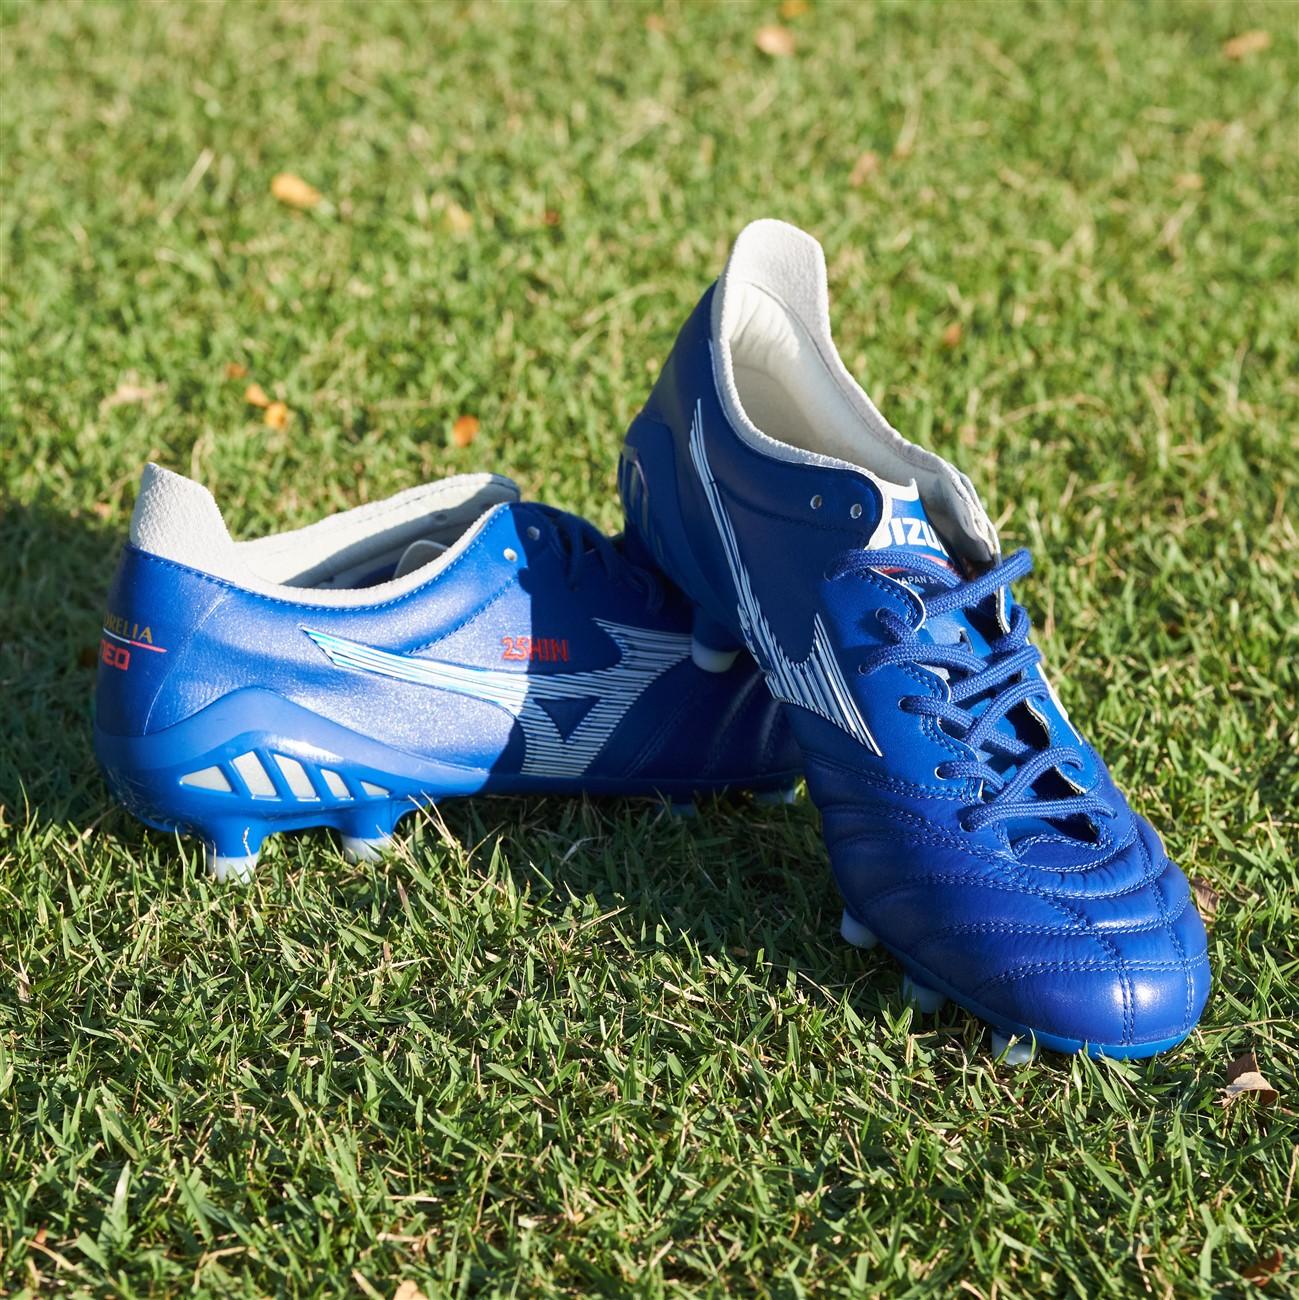 mizuno morelia neo 3 japan football boots soccer cleats review